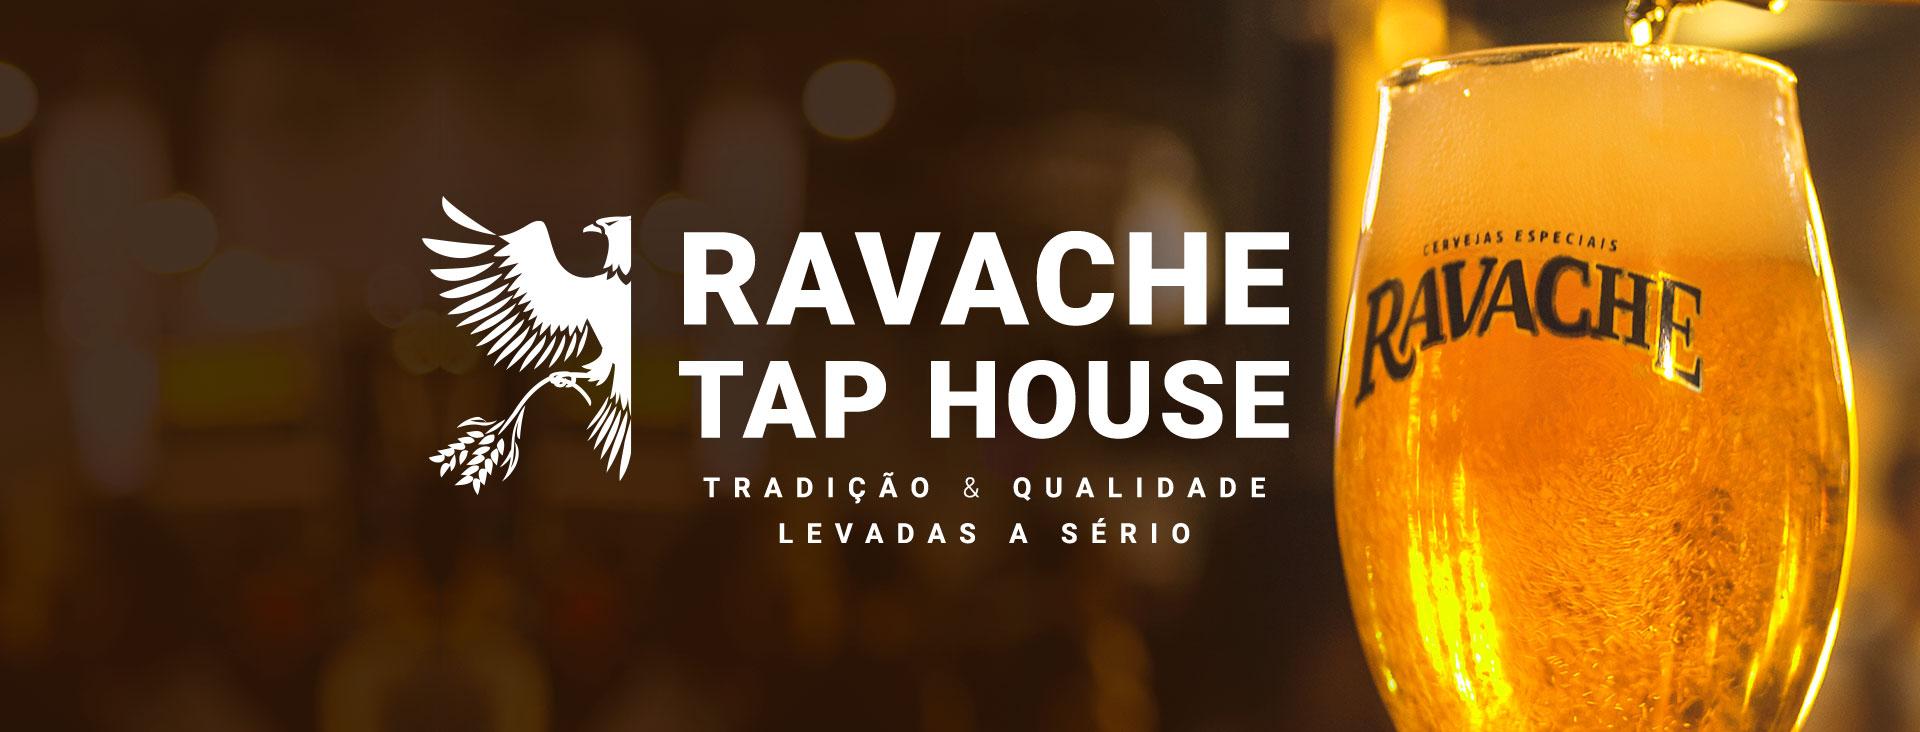 Tap House Ravache